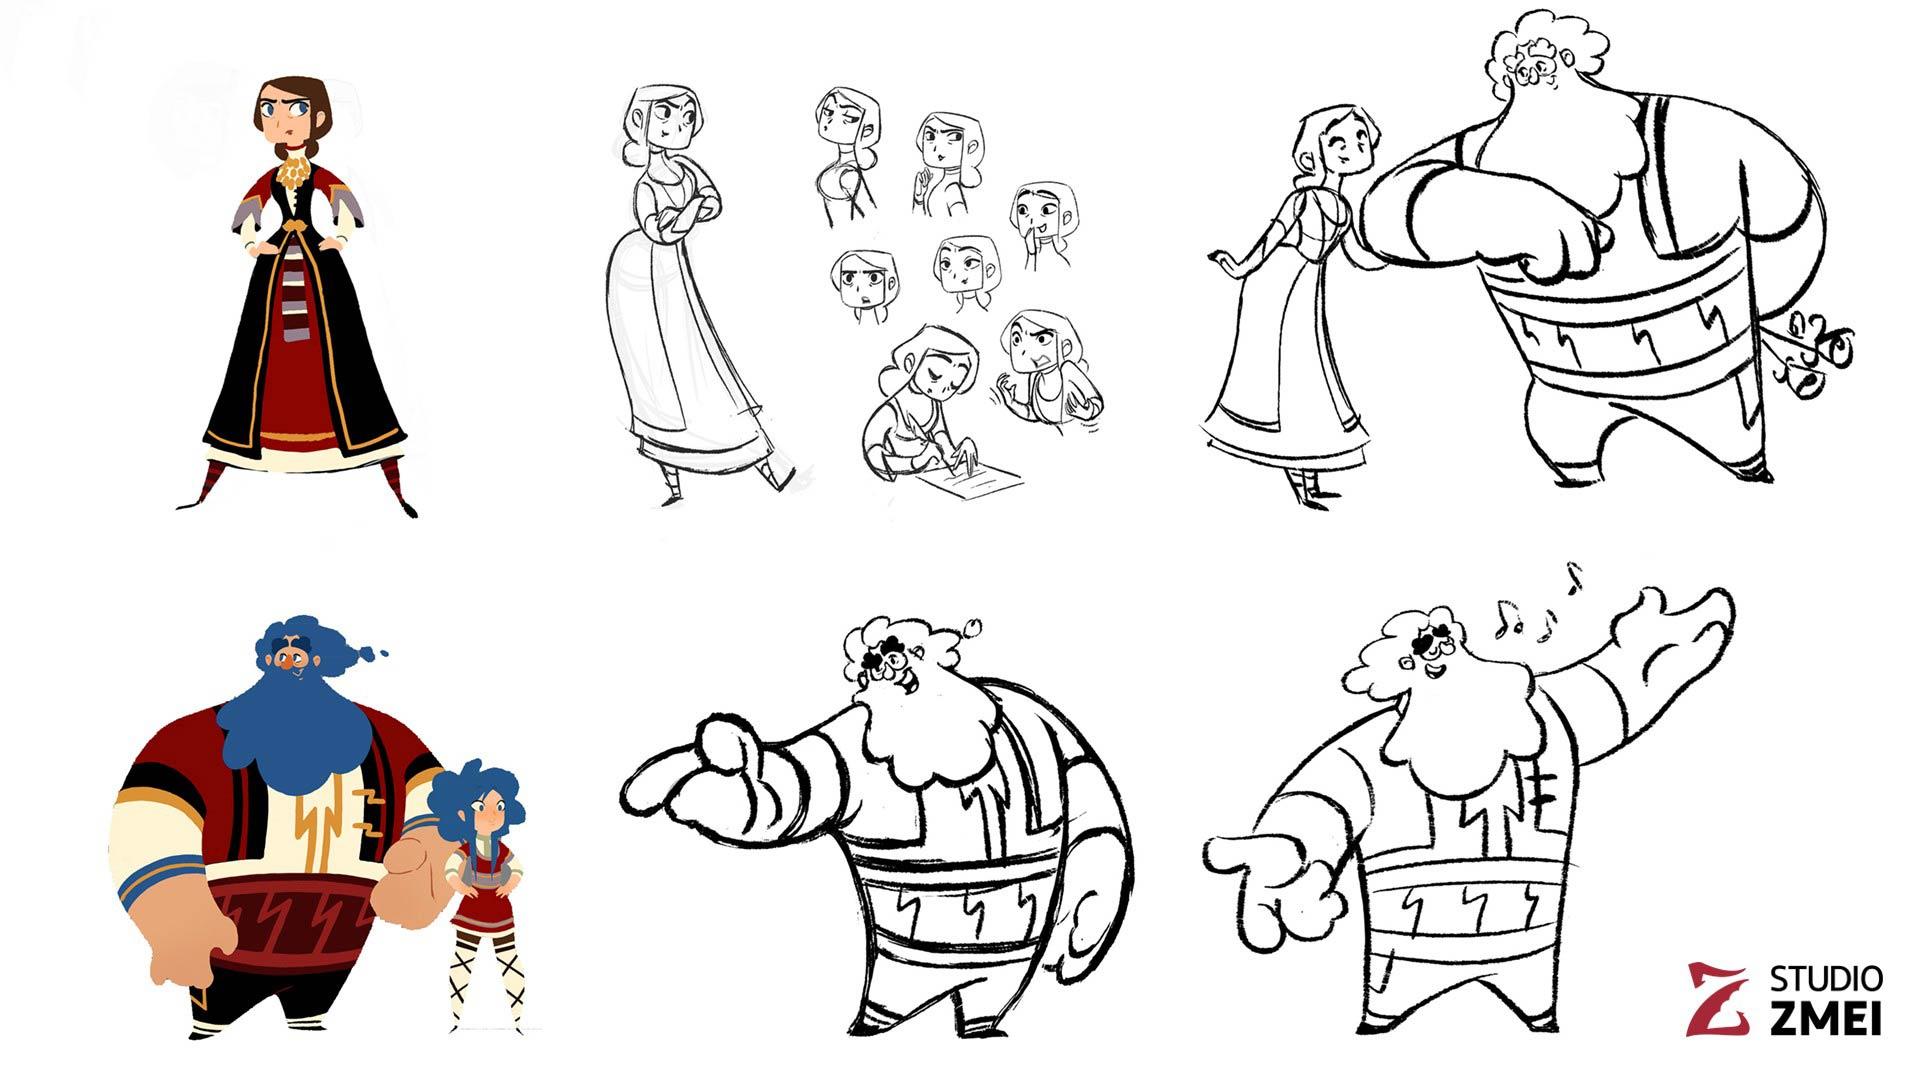 english character design 07 the golden apple studio zmei